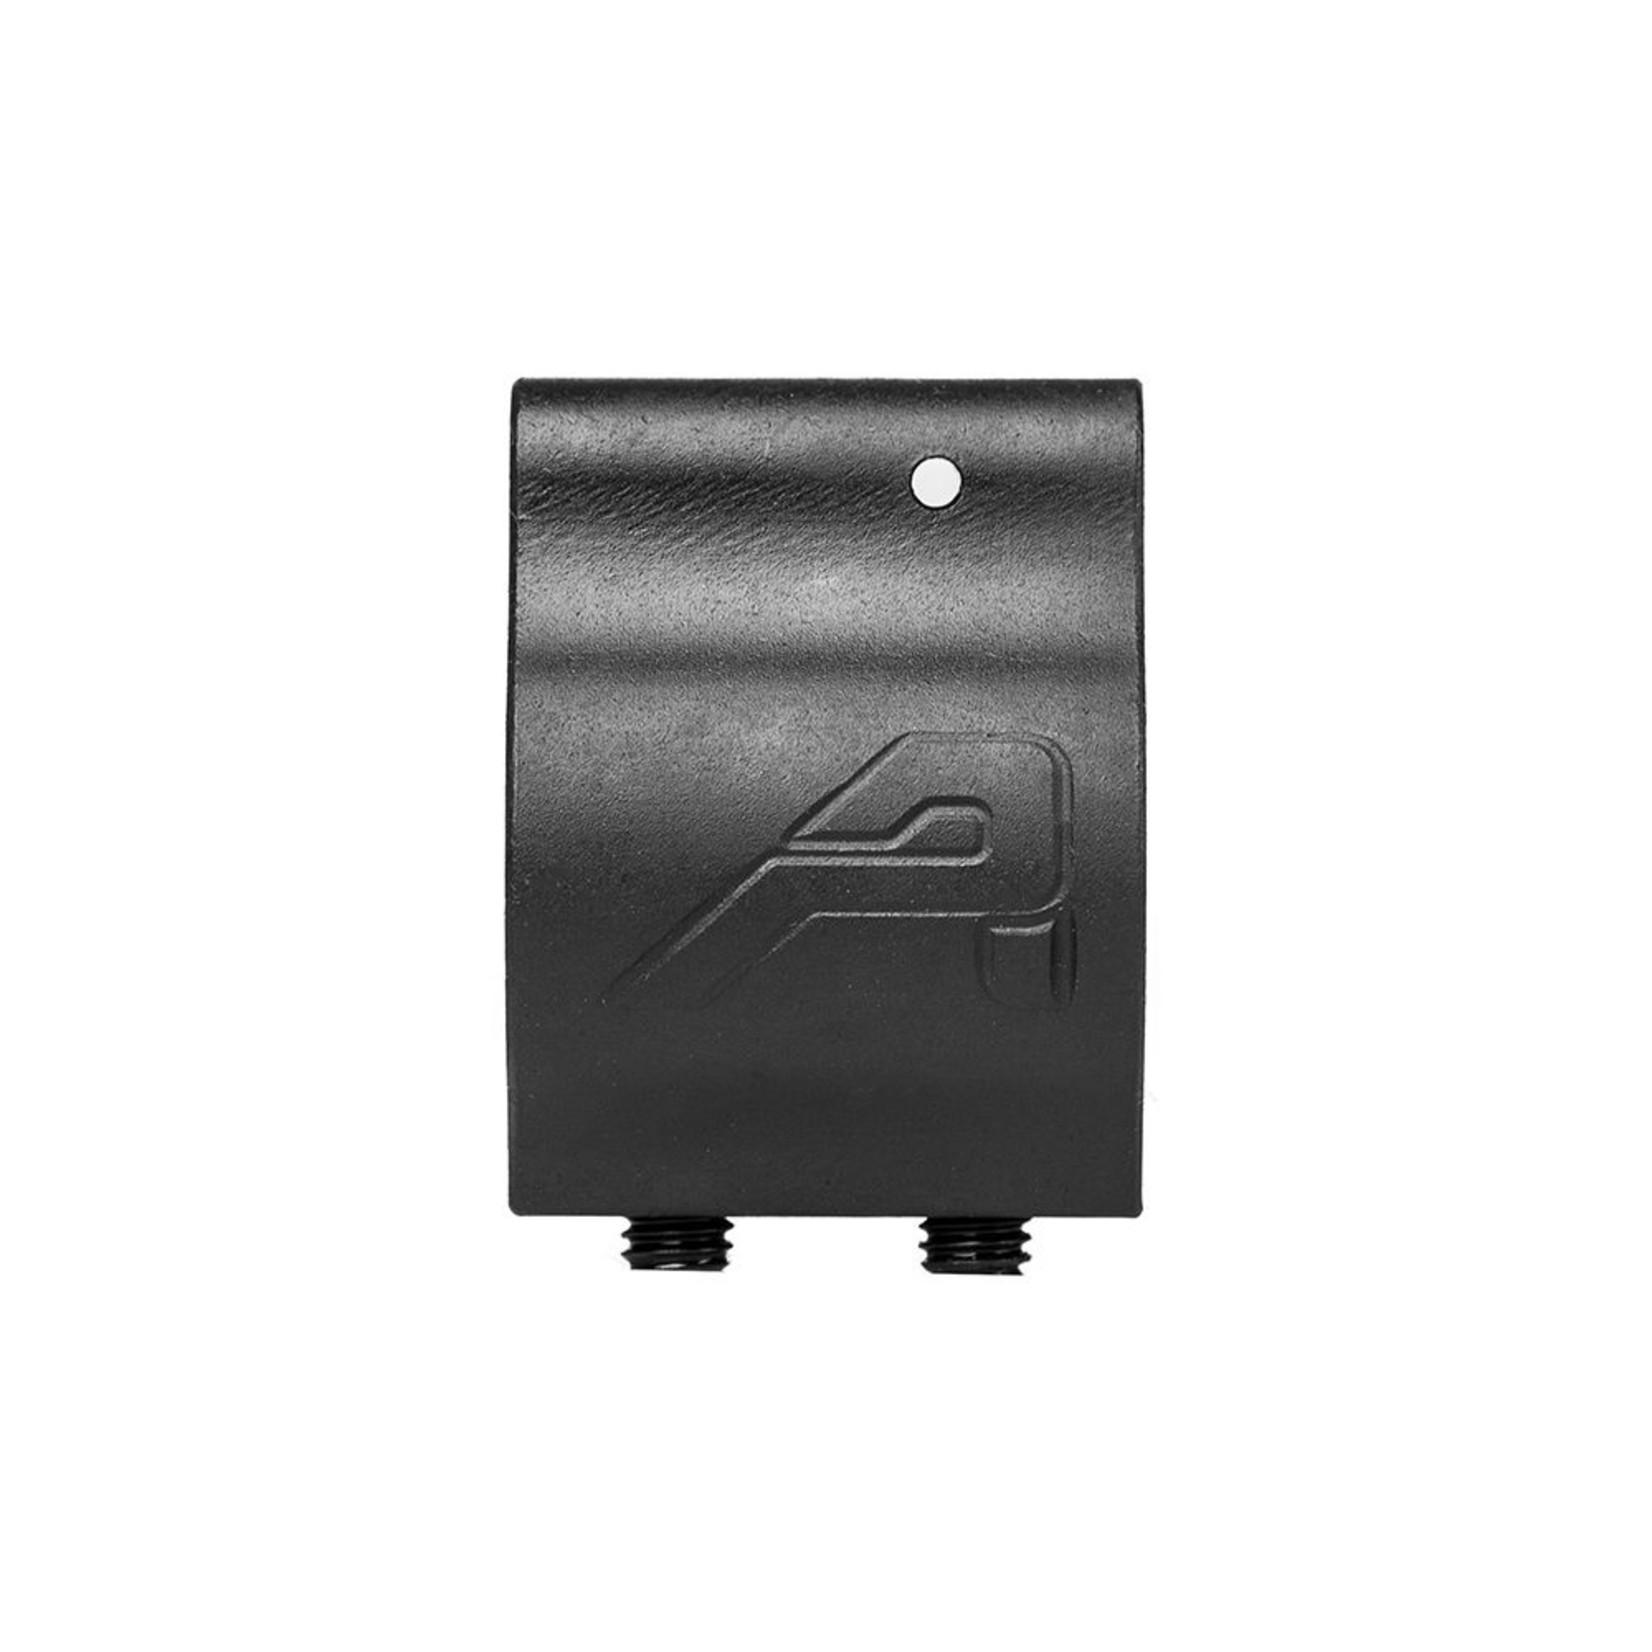 Aero .750 Low Profile Gas Block, Aero Precision